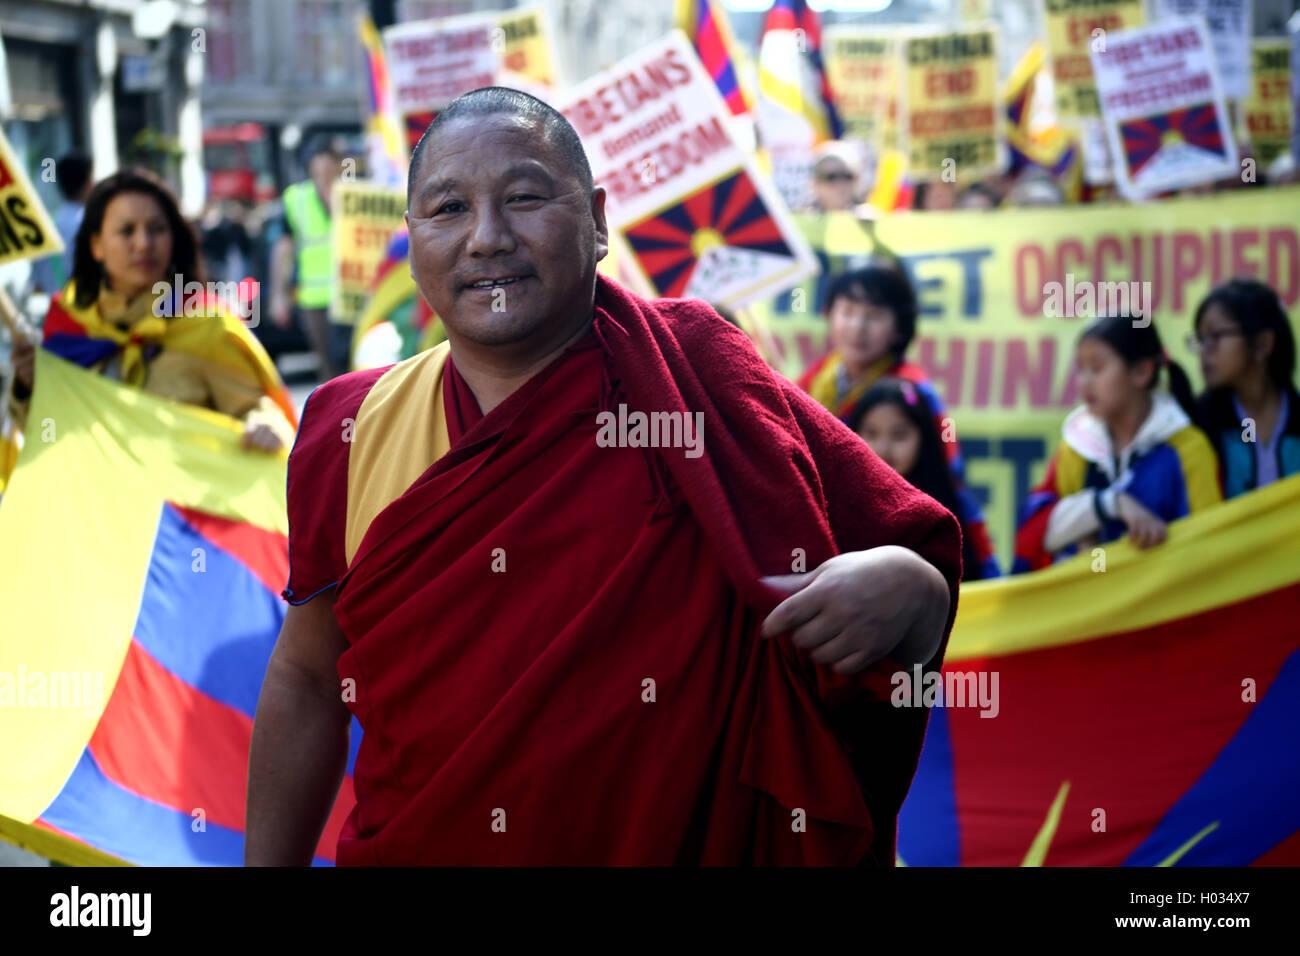 Tibetan monk at the demonstration for free Tibet, London, UK - Stock Image